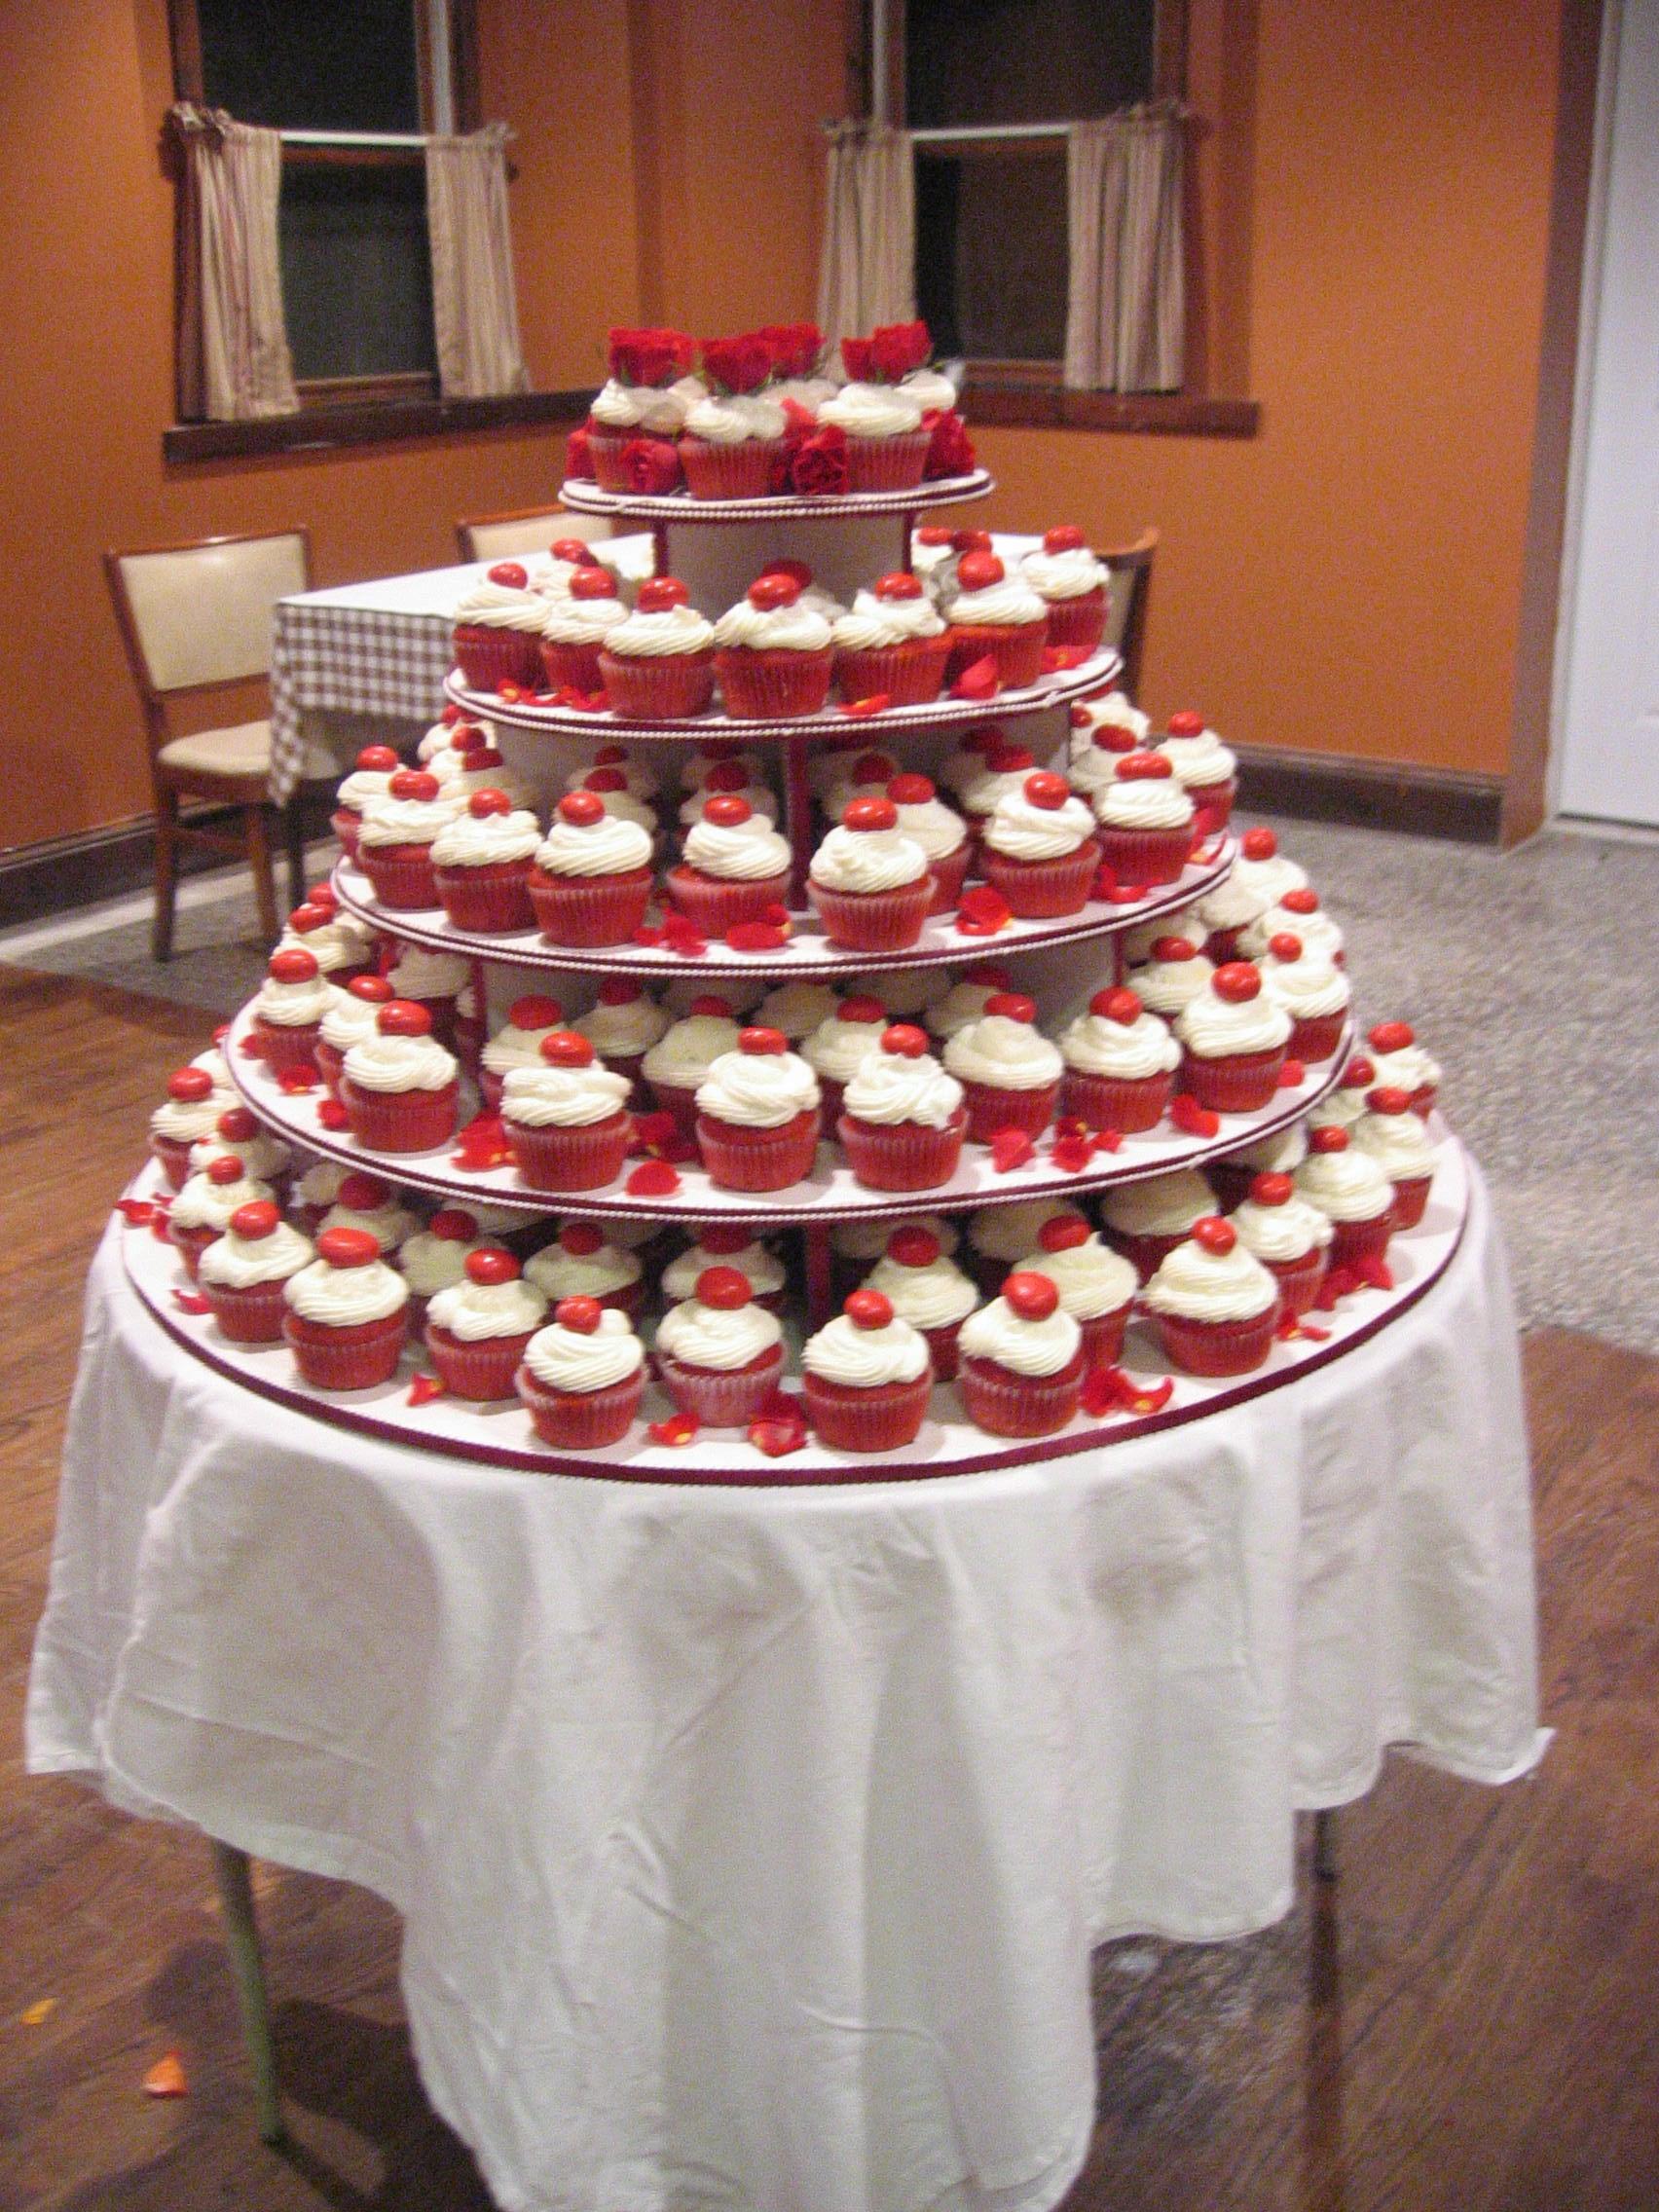 Red Velvet Cupcakes Wedding Viewing Gallery